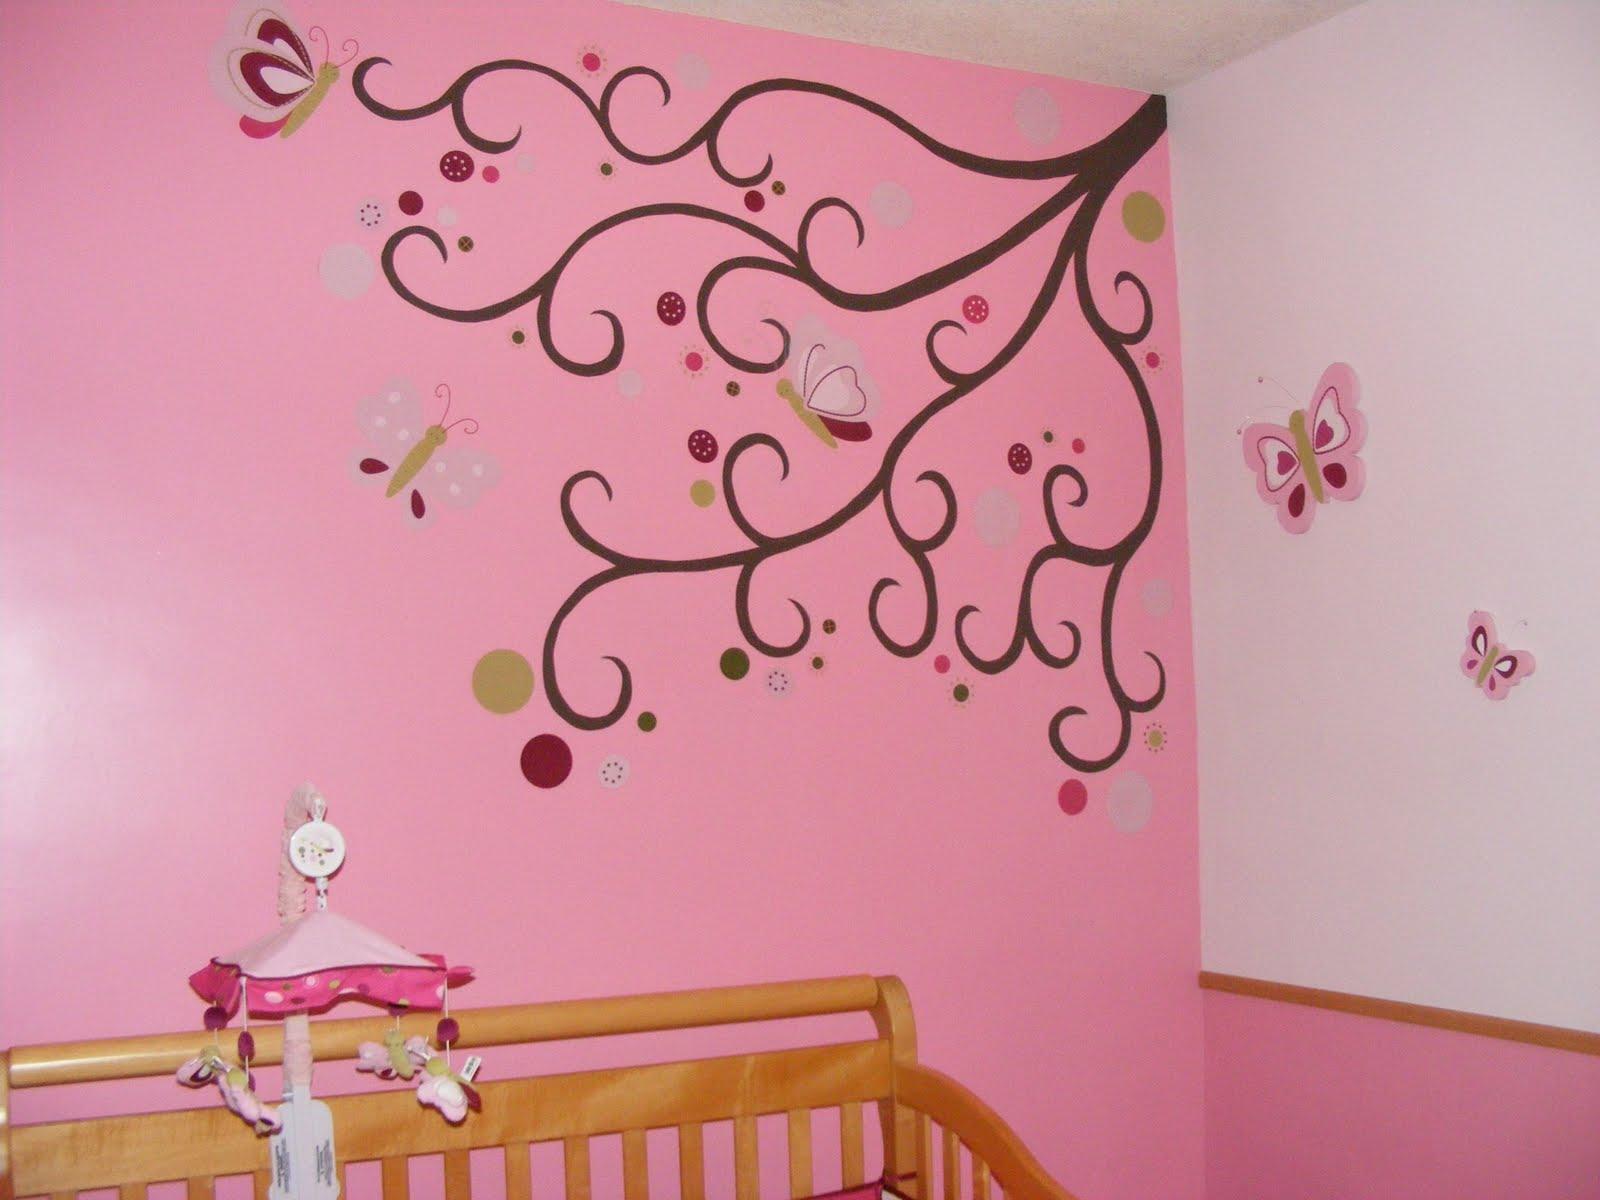 Murales infantiles 03 25 10 for Mural de flores y mariposas